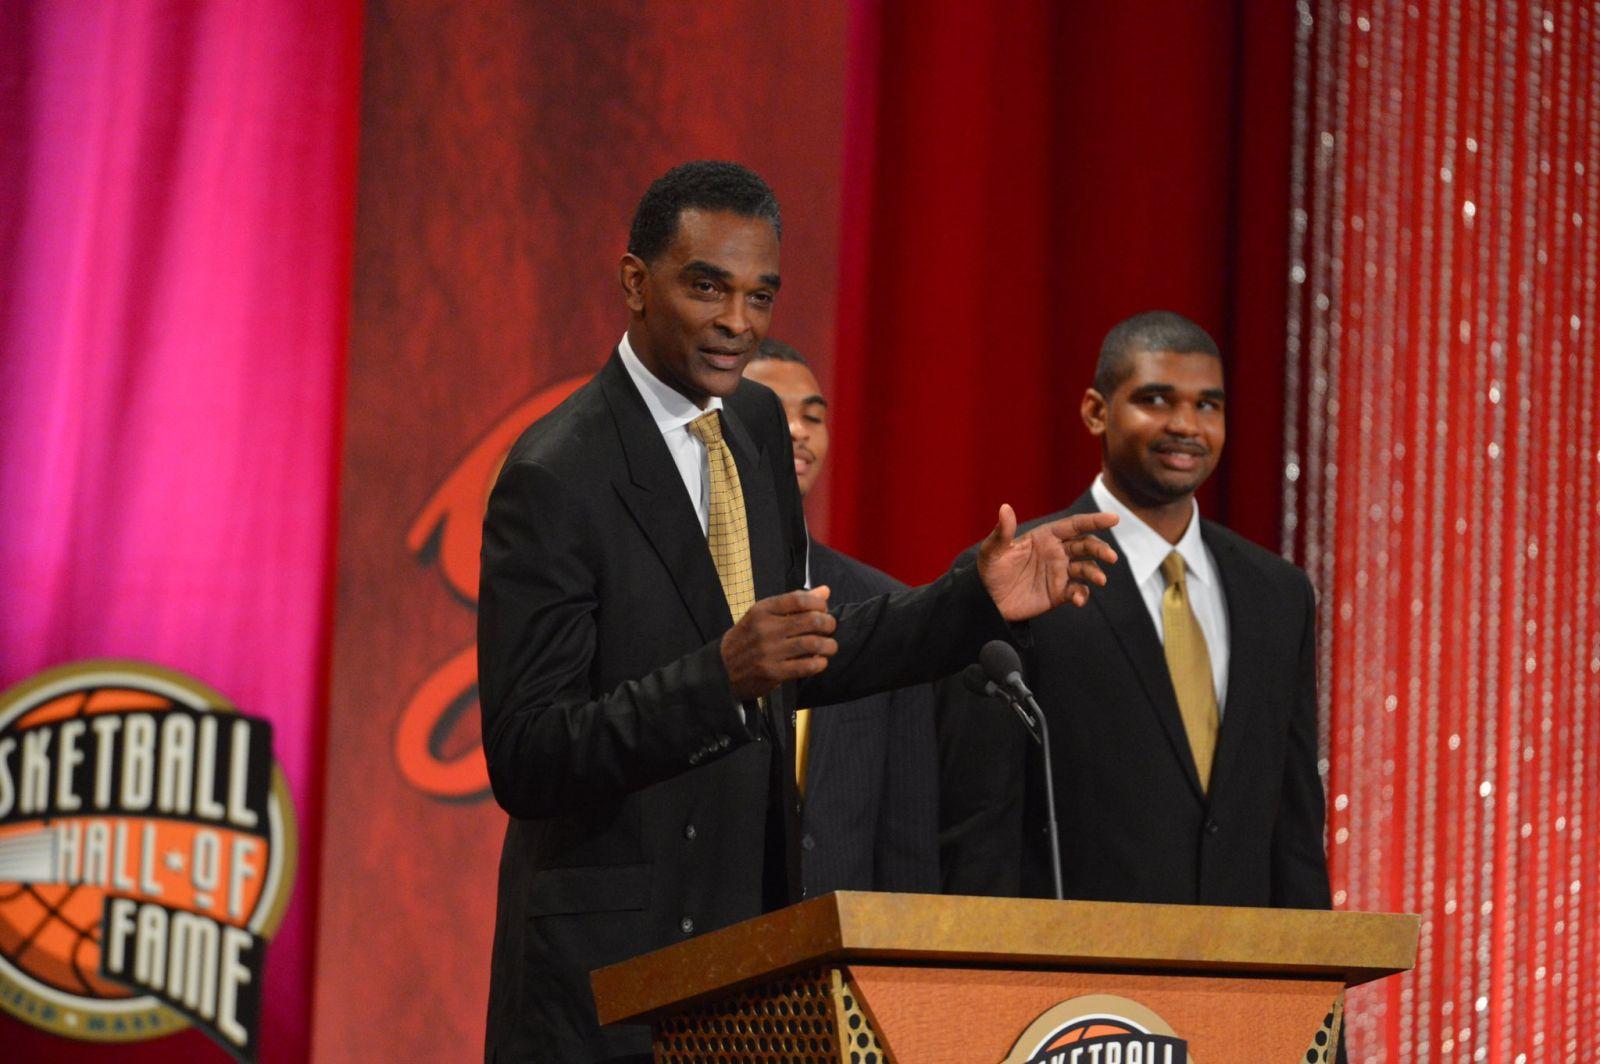 NBA官方祝名人堂球员拉尔夫-桑普森60岁生日快乐